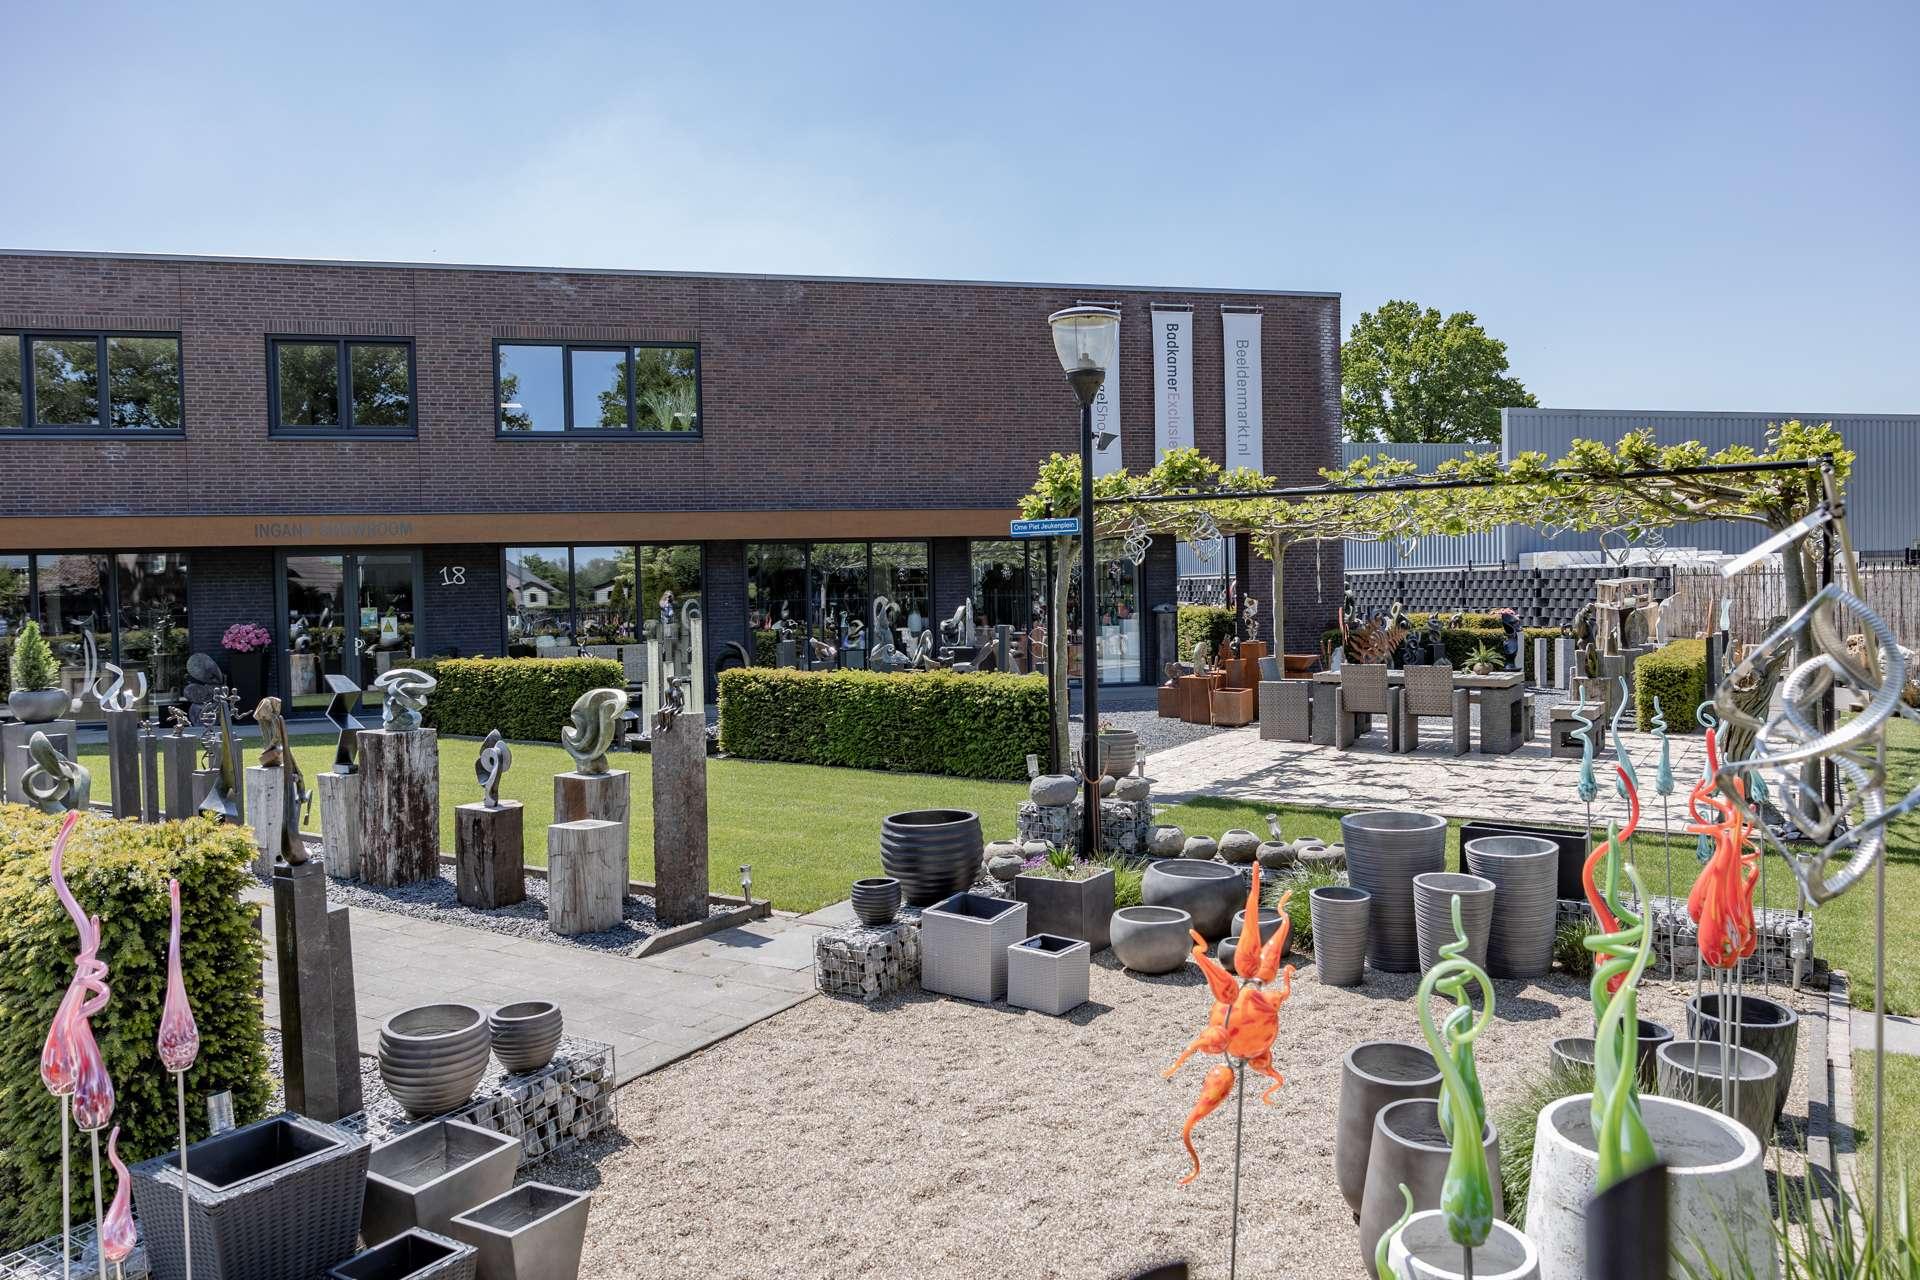 Overzichtsfoto Showtuin Beeldenmarkt.nl